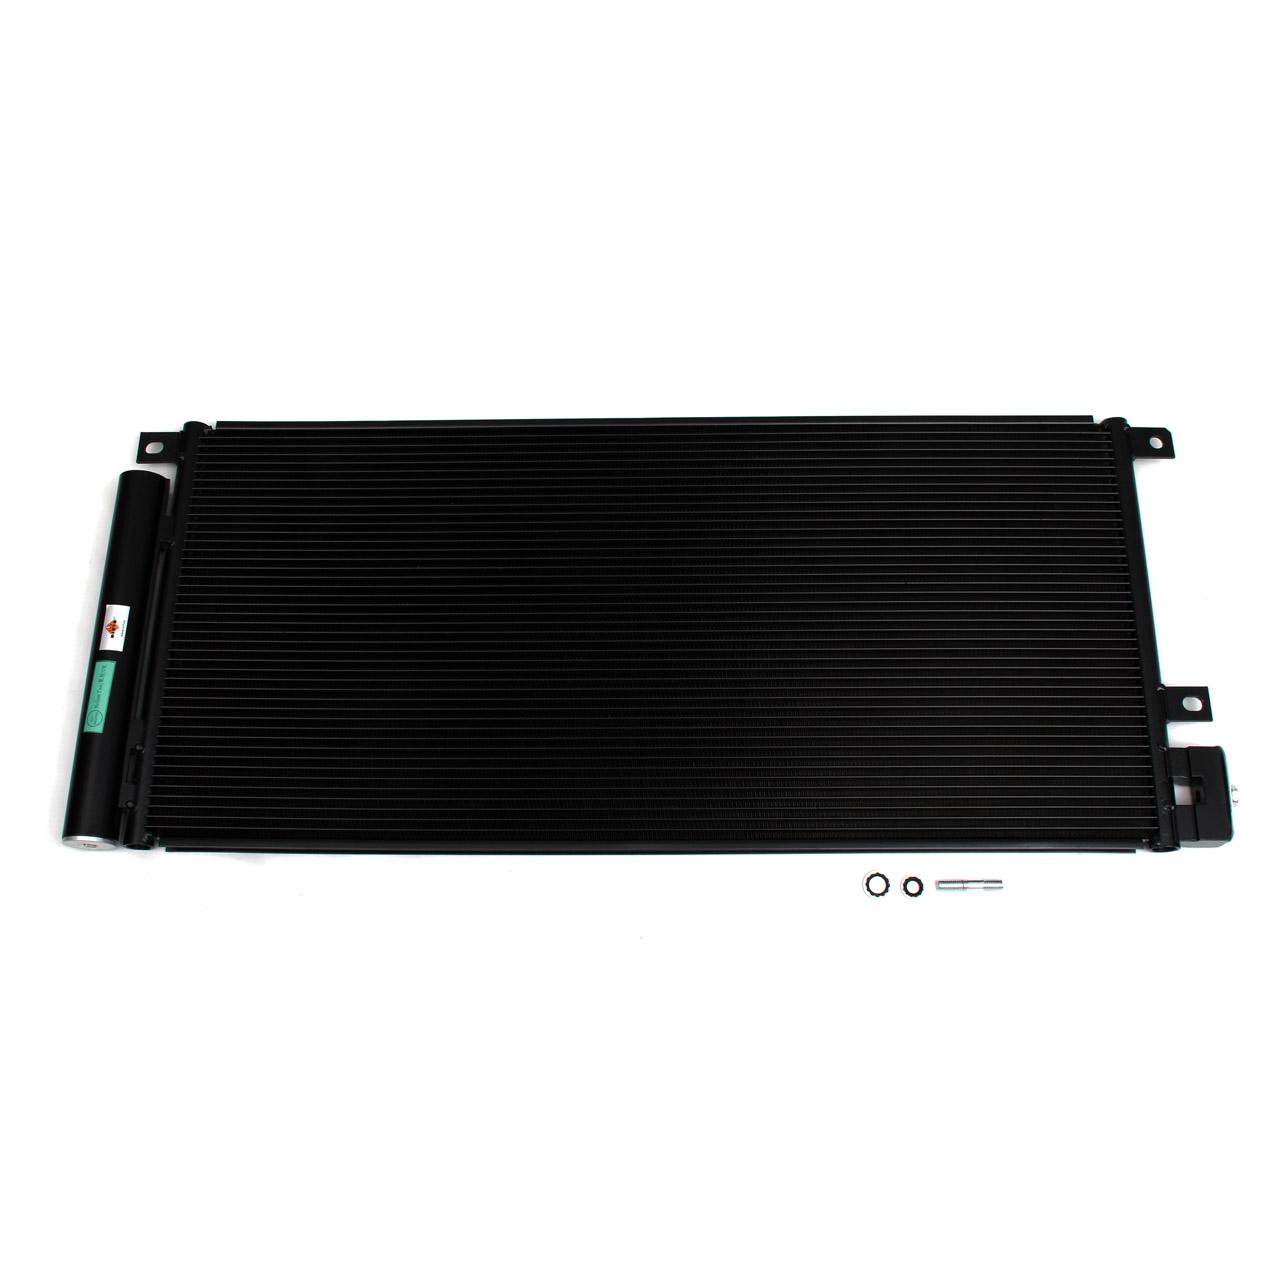 NRF 350067 Kondensator Klima EASY FIT OPEL Mokka / Mokka X J13 CHEVROLET Trax 1.4 95321793